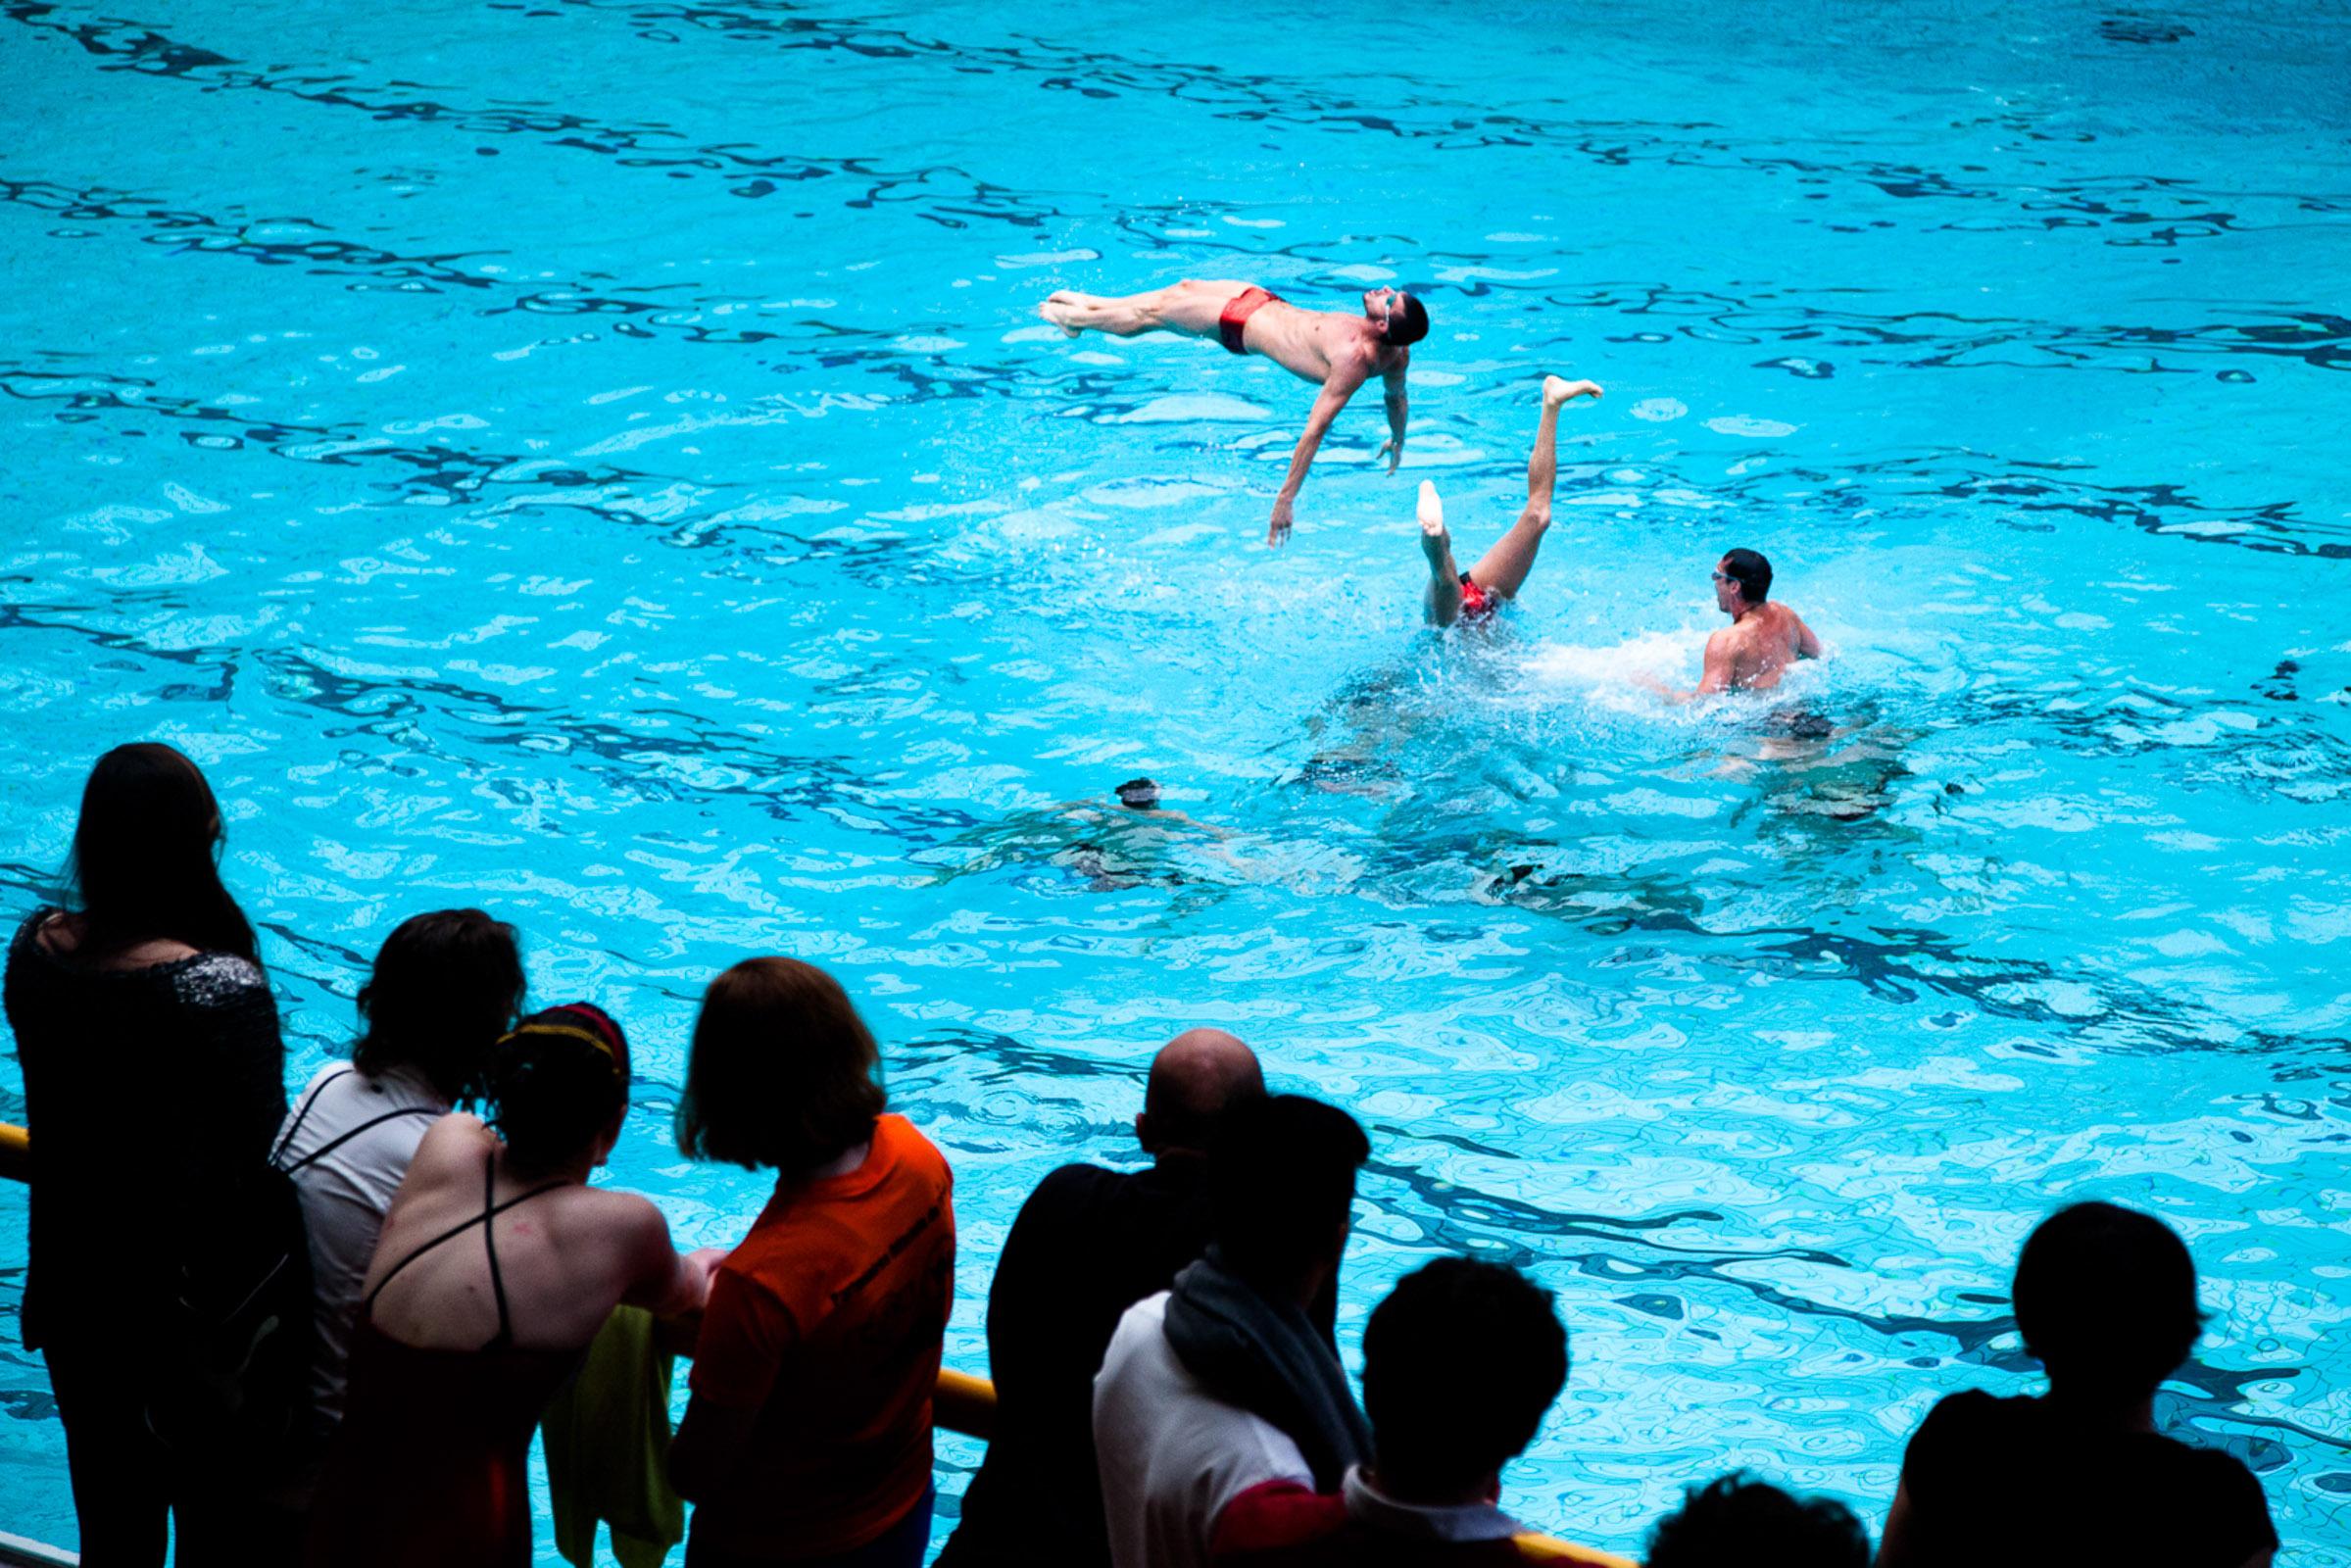 Paris, 18 Mai 2013. L'équipe du Paris aquatique lors du tournoi international de Paris.  Paris, May 18th 2013. Paris Aquatique Male synchronized swimming team during the international Paris Tournament.